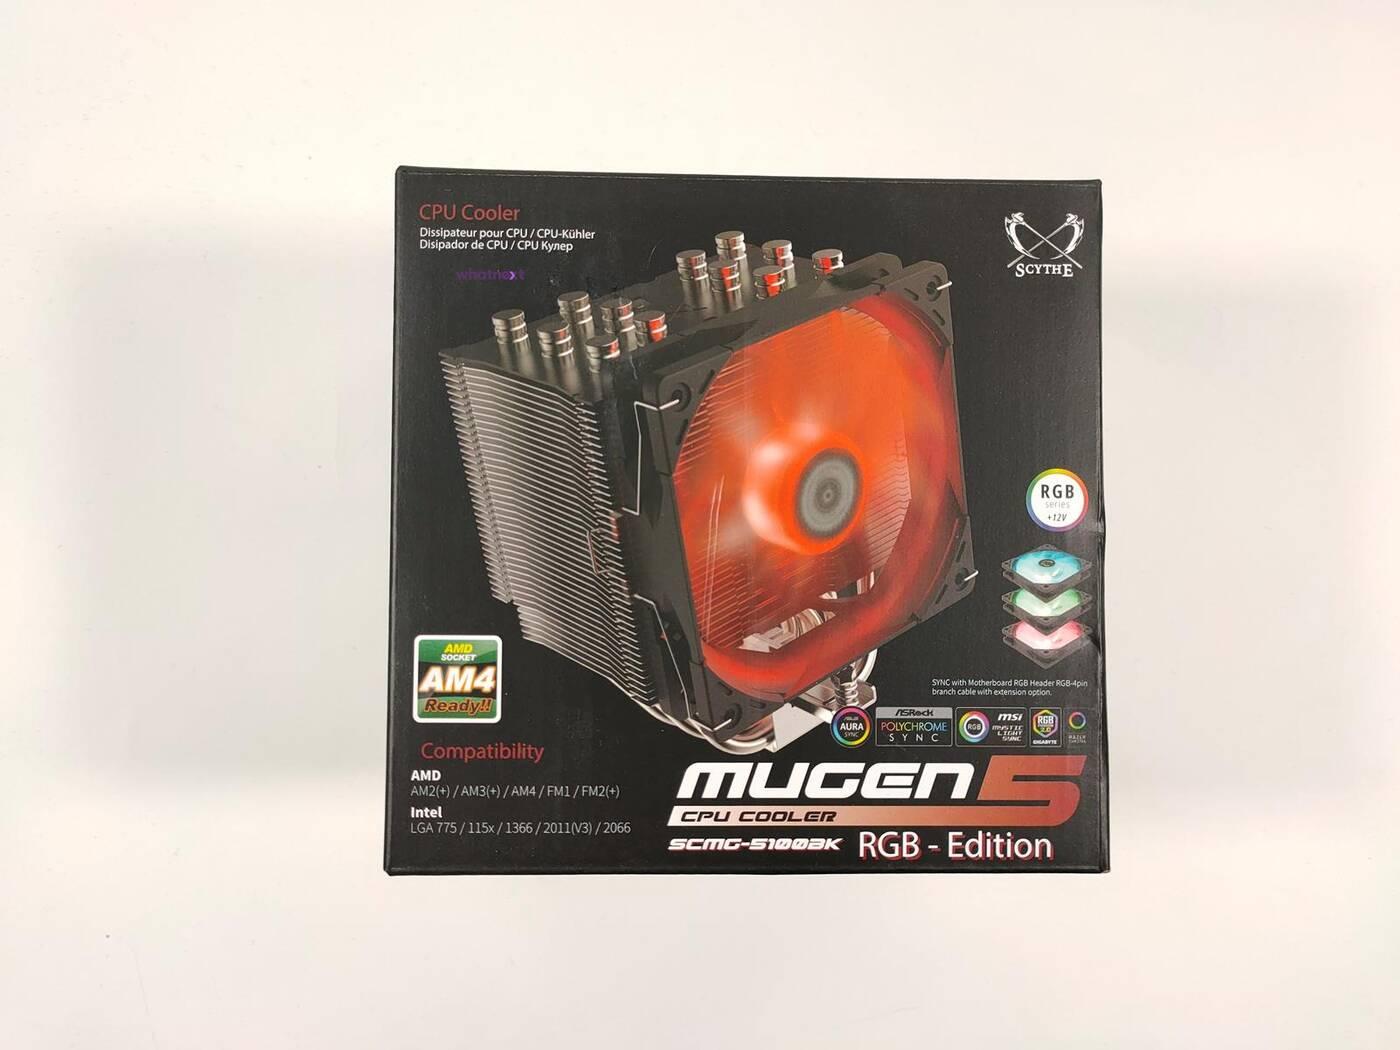 test Scythe Mugen 5 Black RGB Edition, recenzja Scythe Mugen 5 Black RGB Edition, review Scythe Mugen 5 Black RGB Edition, opinia Scythe Mugen 5 Black RGB Edition